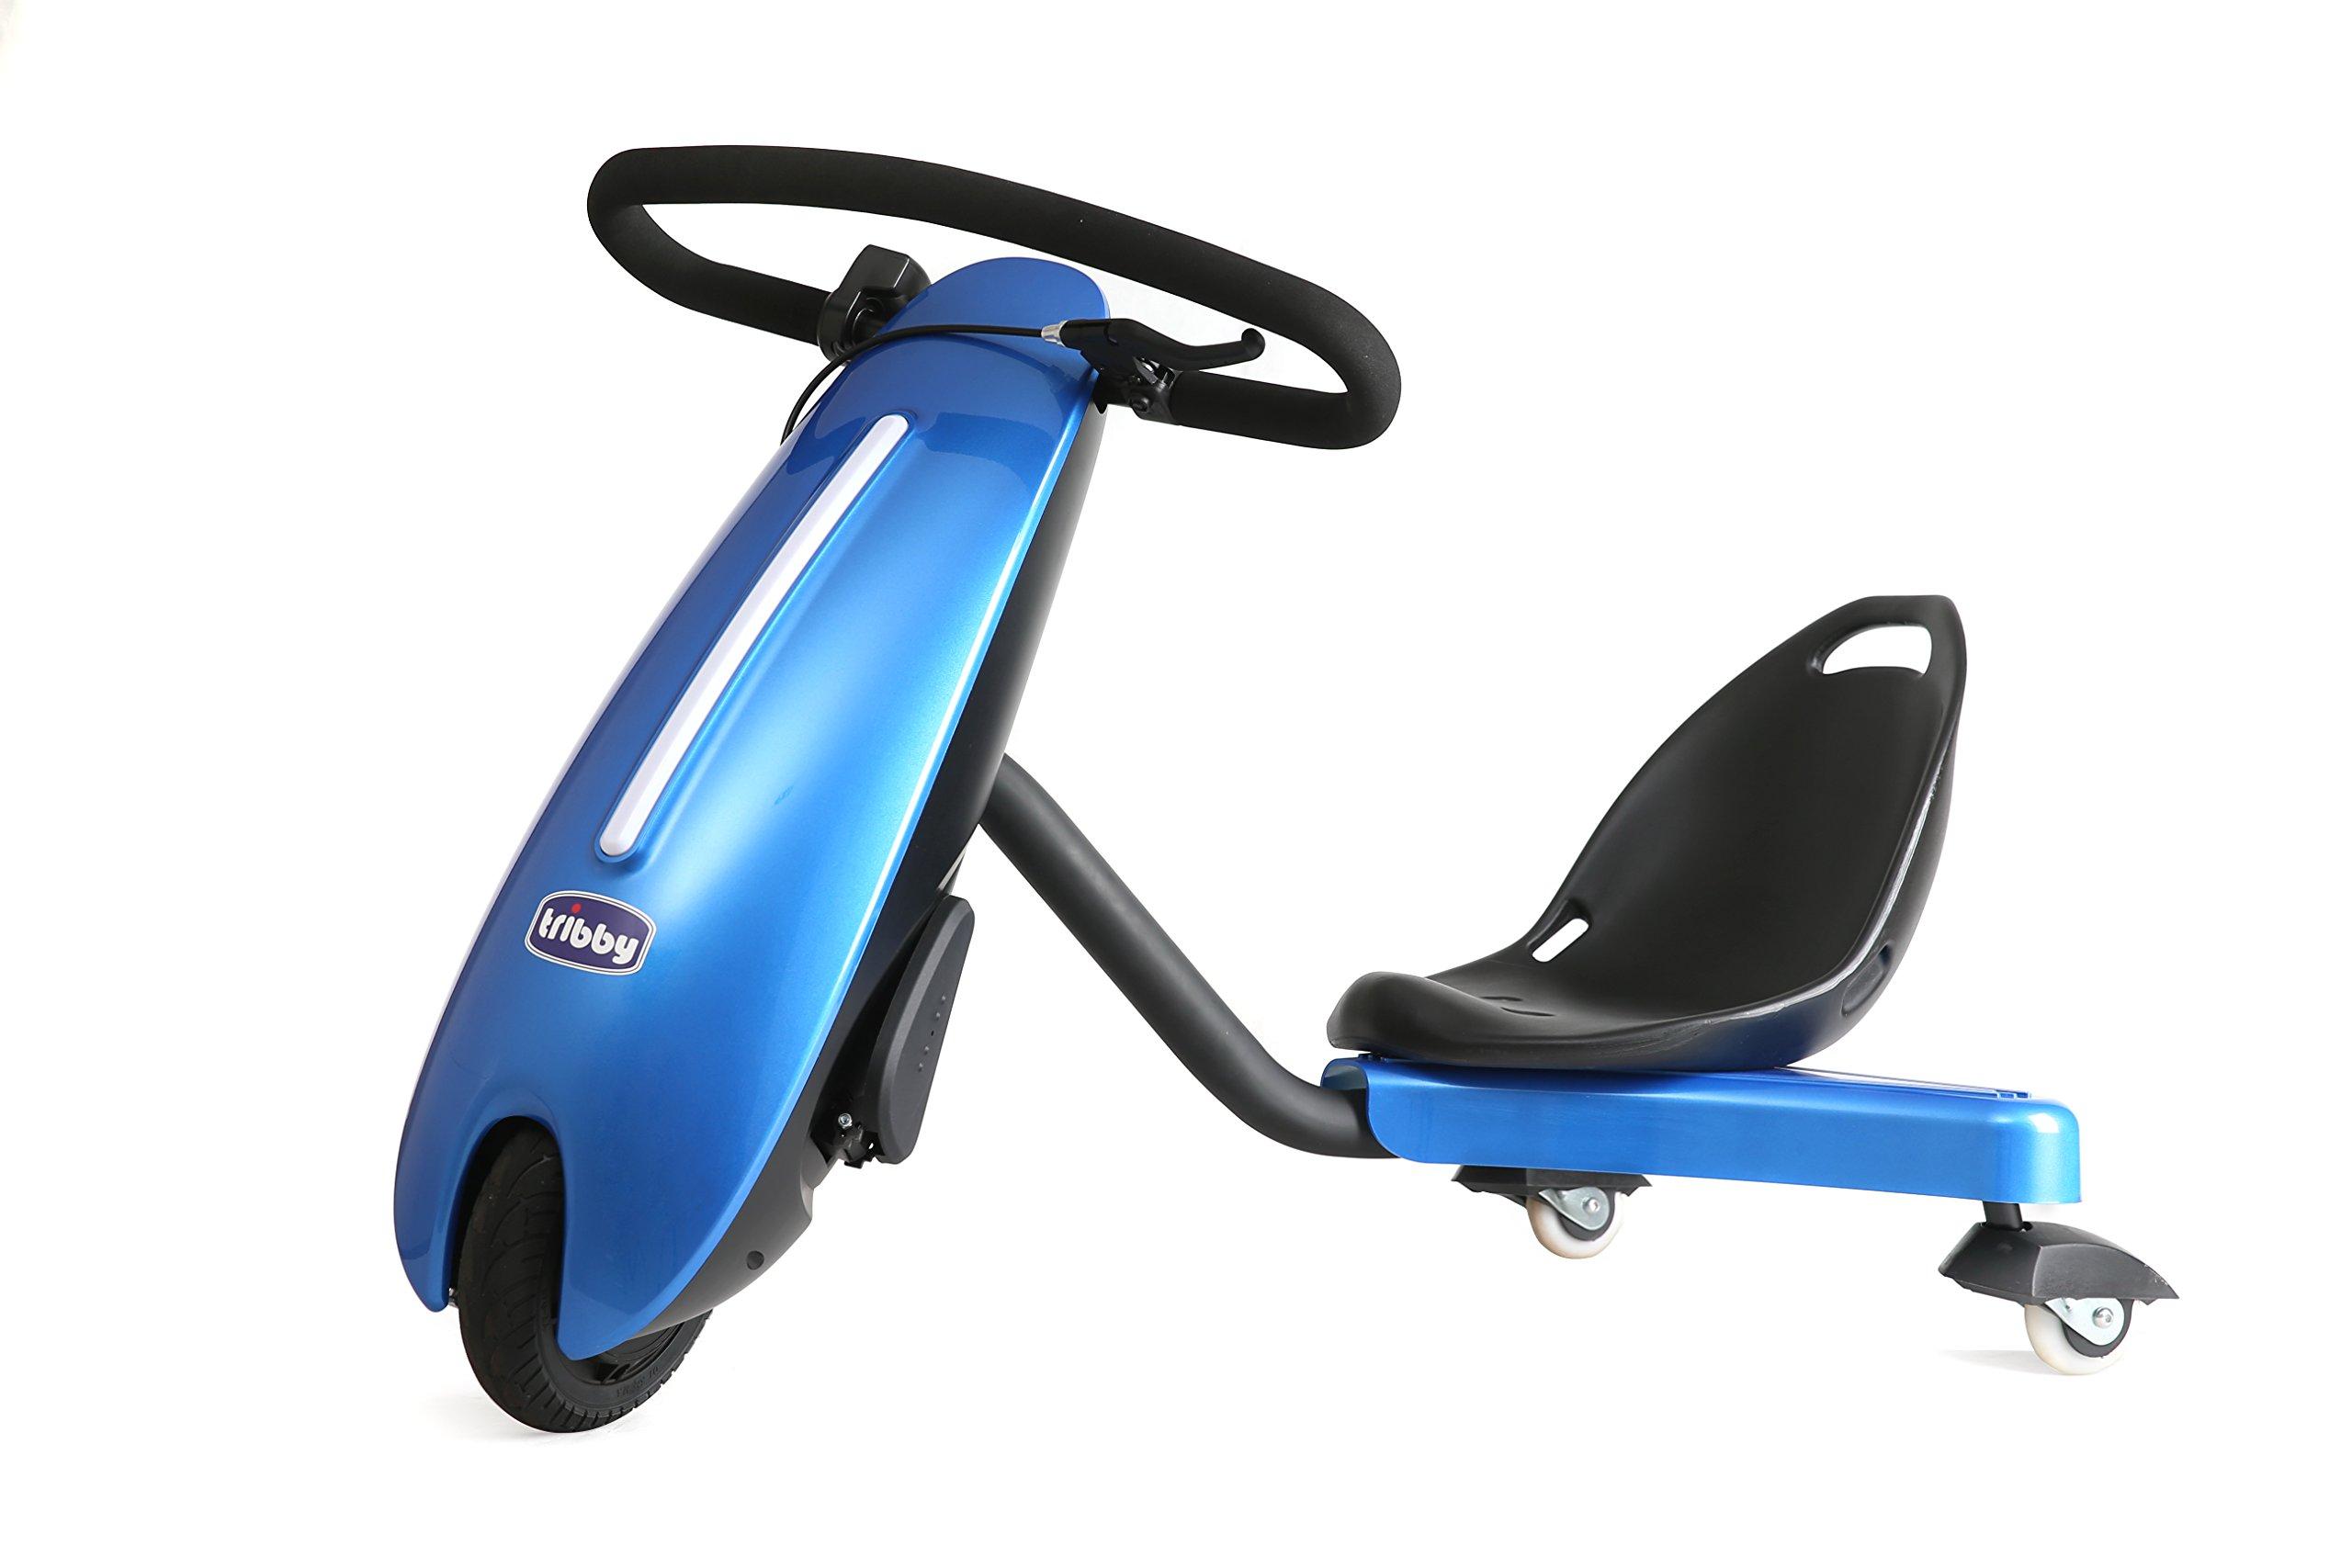 tribby Drift Trike For Kids, Blue by Tribby